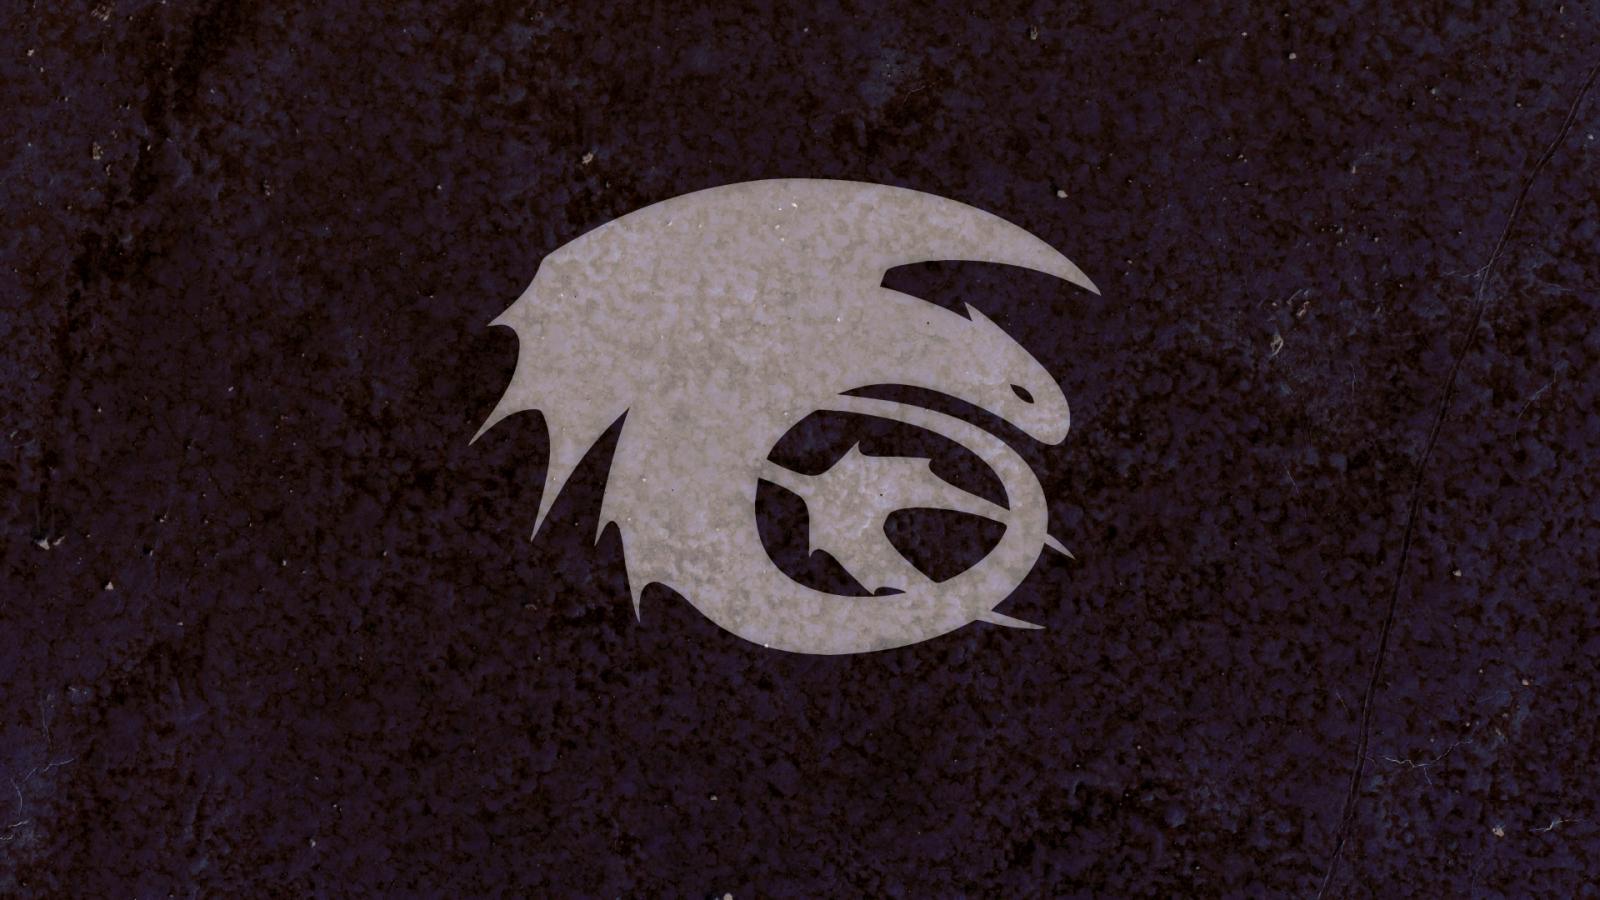 Night Fury Wallpaper 1600x900